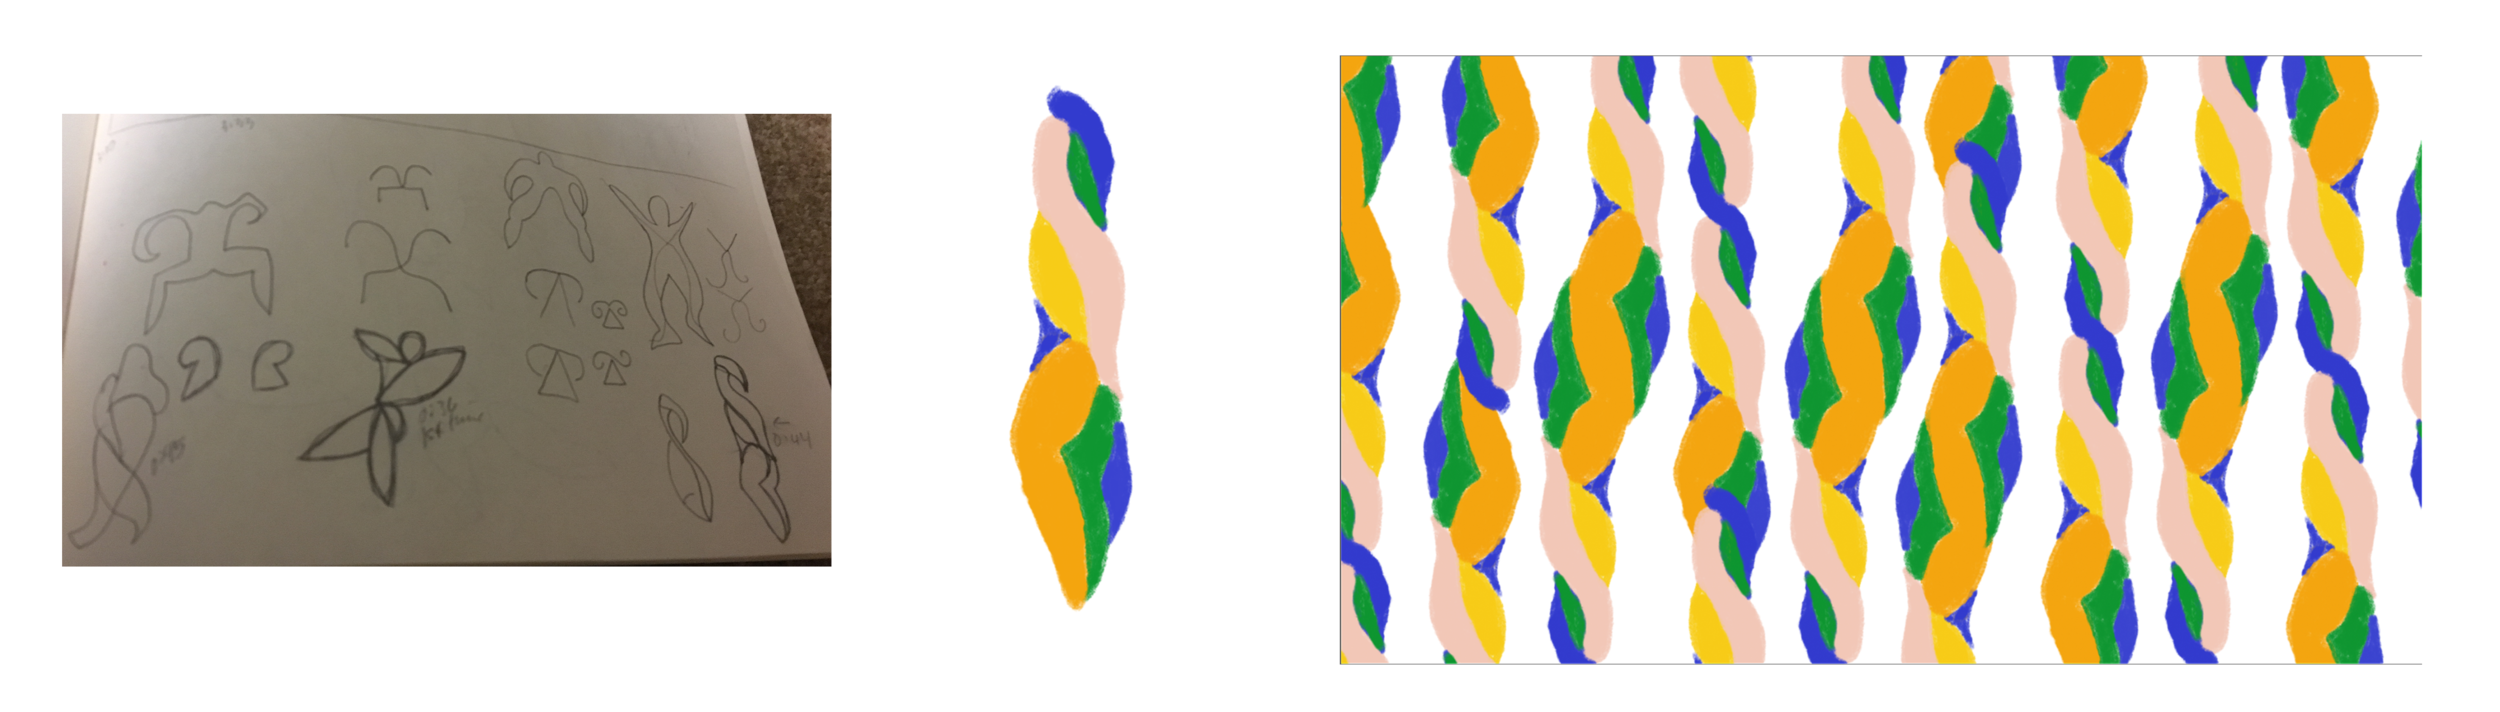 process-pattern1.png